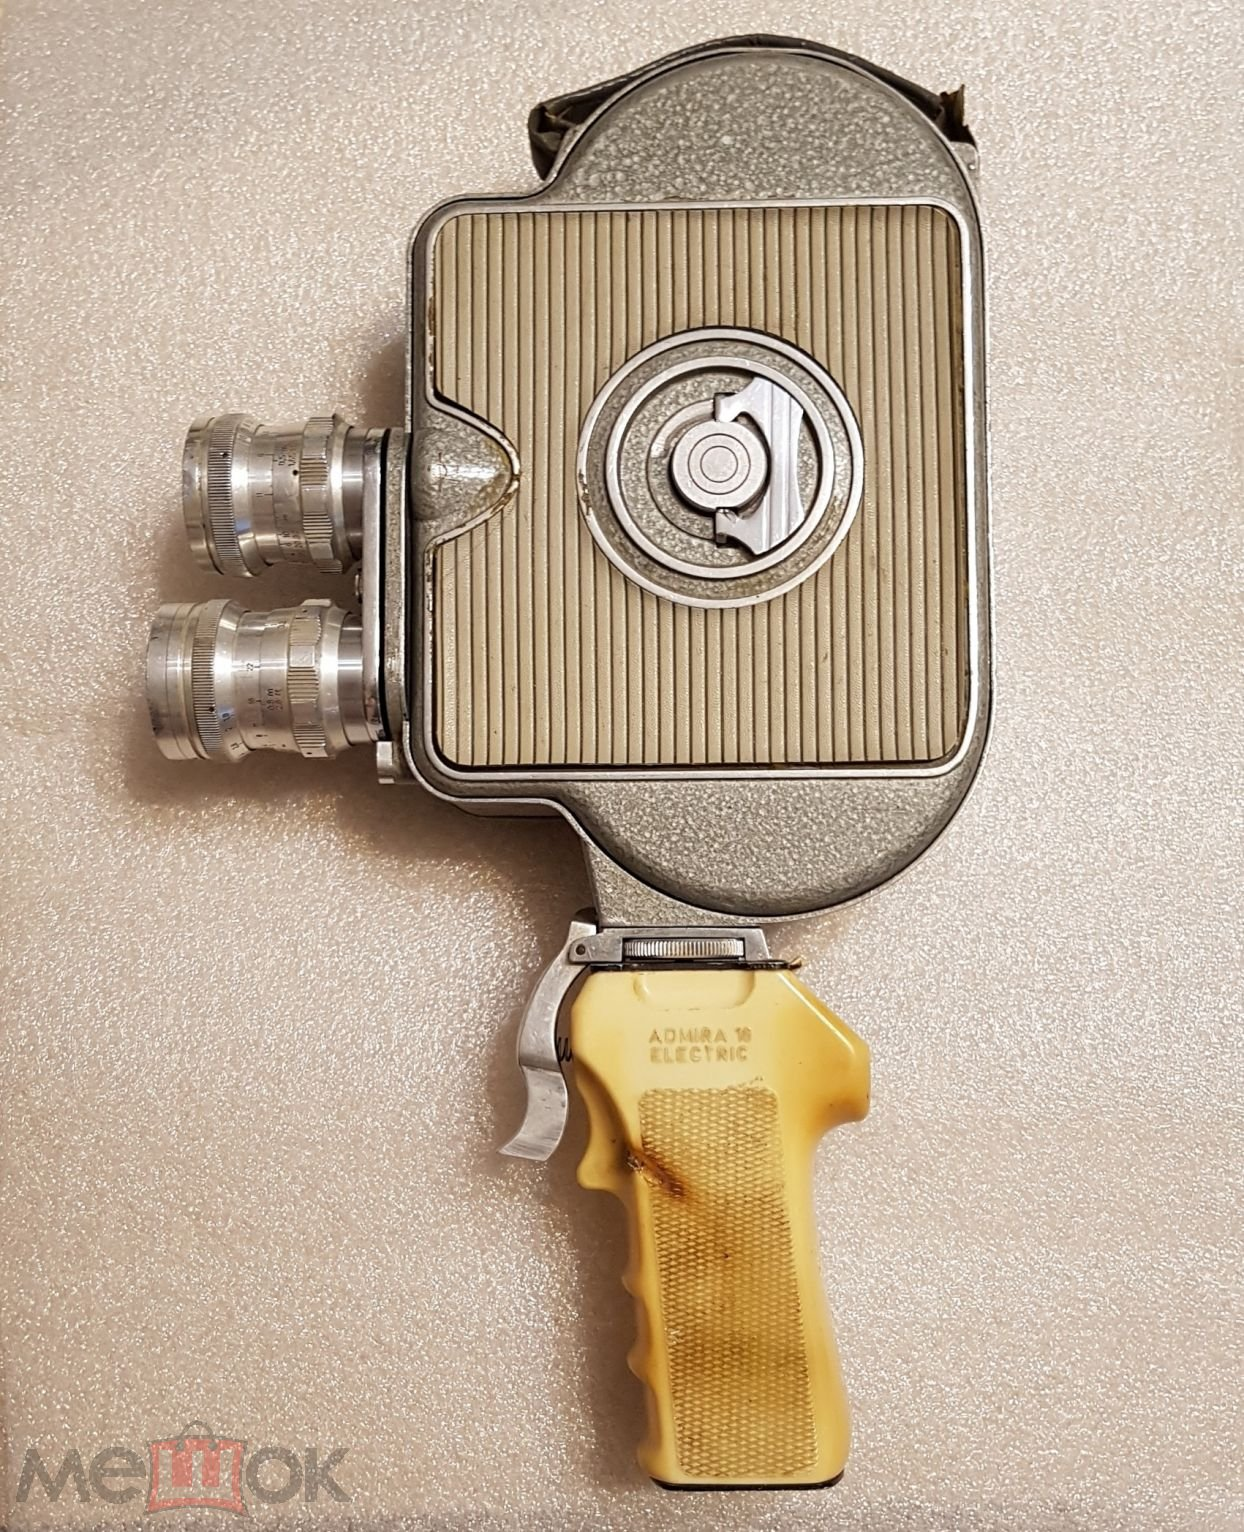 Кинокамера Admira 16А Electric. Чехословакия(1958 г.)   ТОРГ!!!